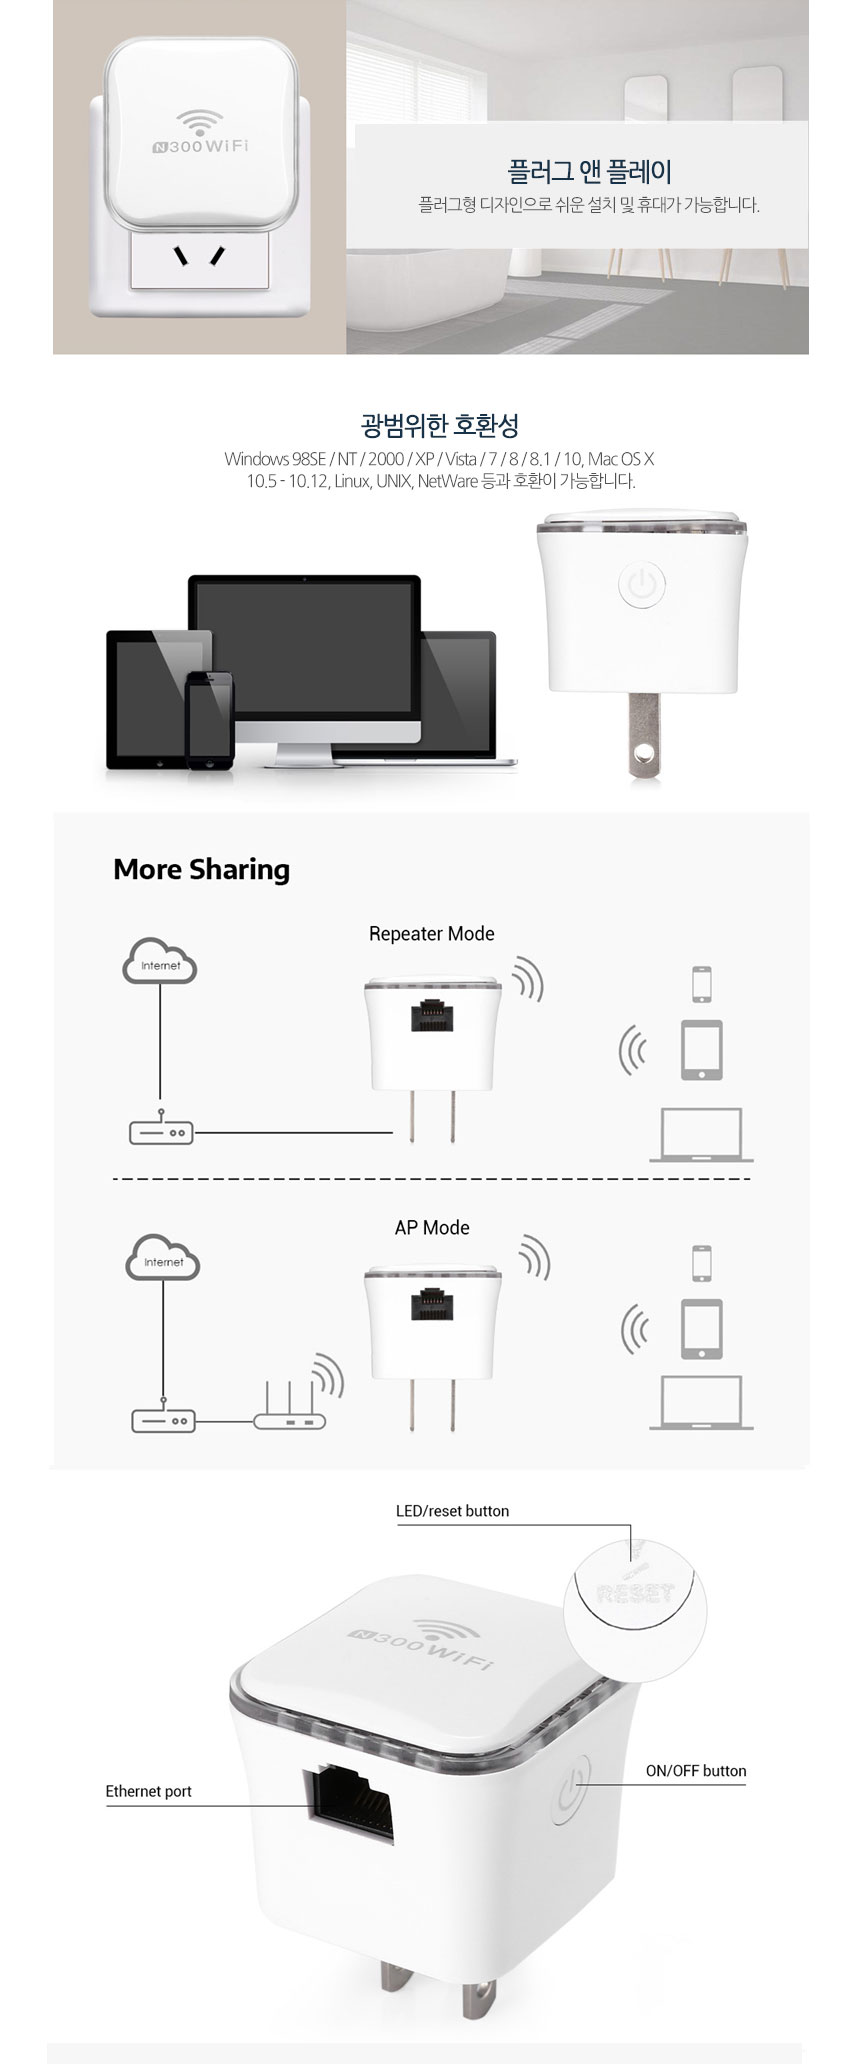 G마켓 - Meross MRE120 WiFi 300Mbps 플러그형 무선 리피터